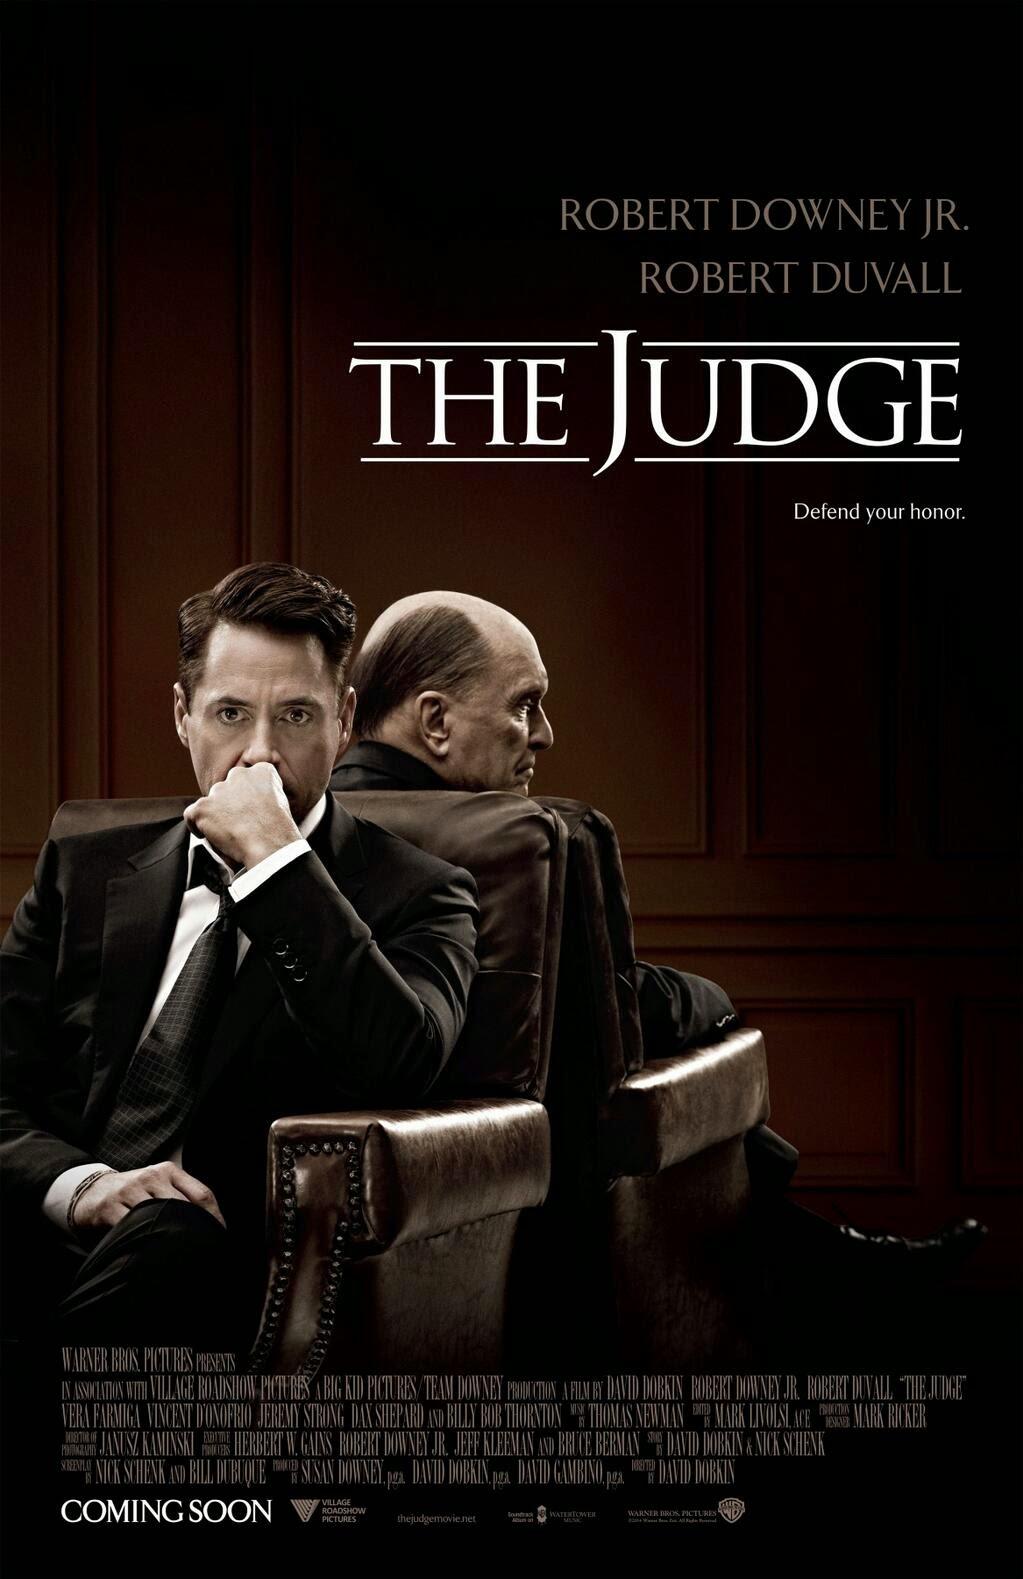 sędzia recenzja filmu robert downey jr. robert duvall